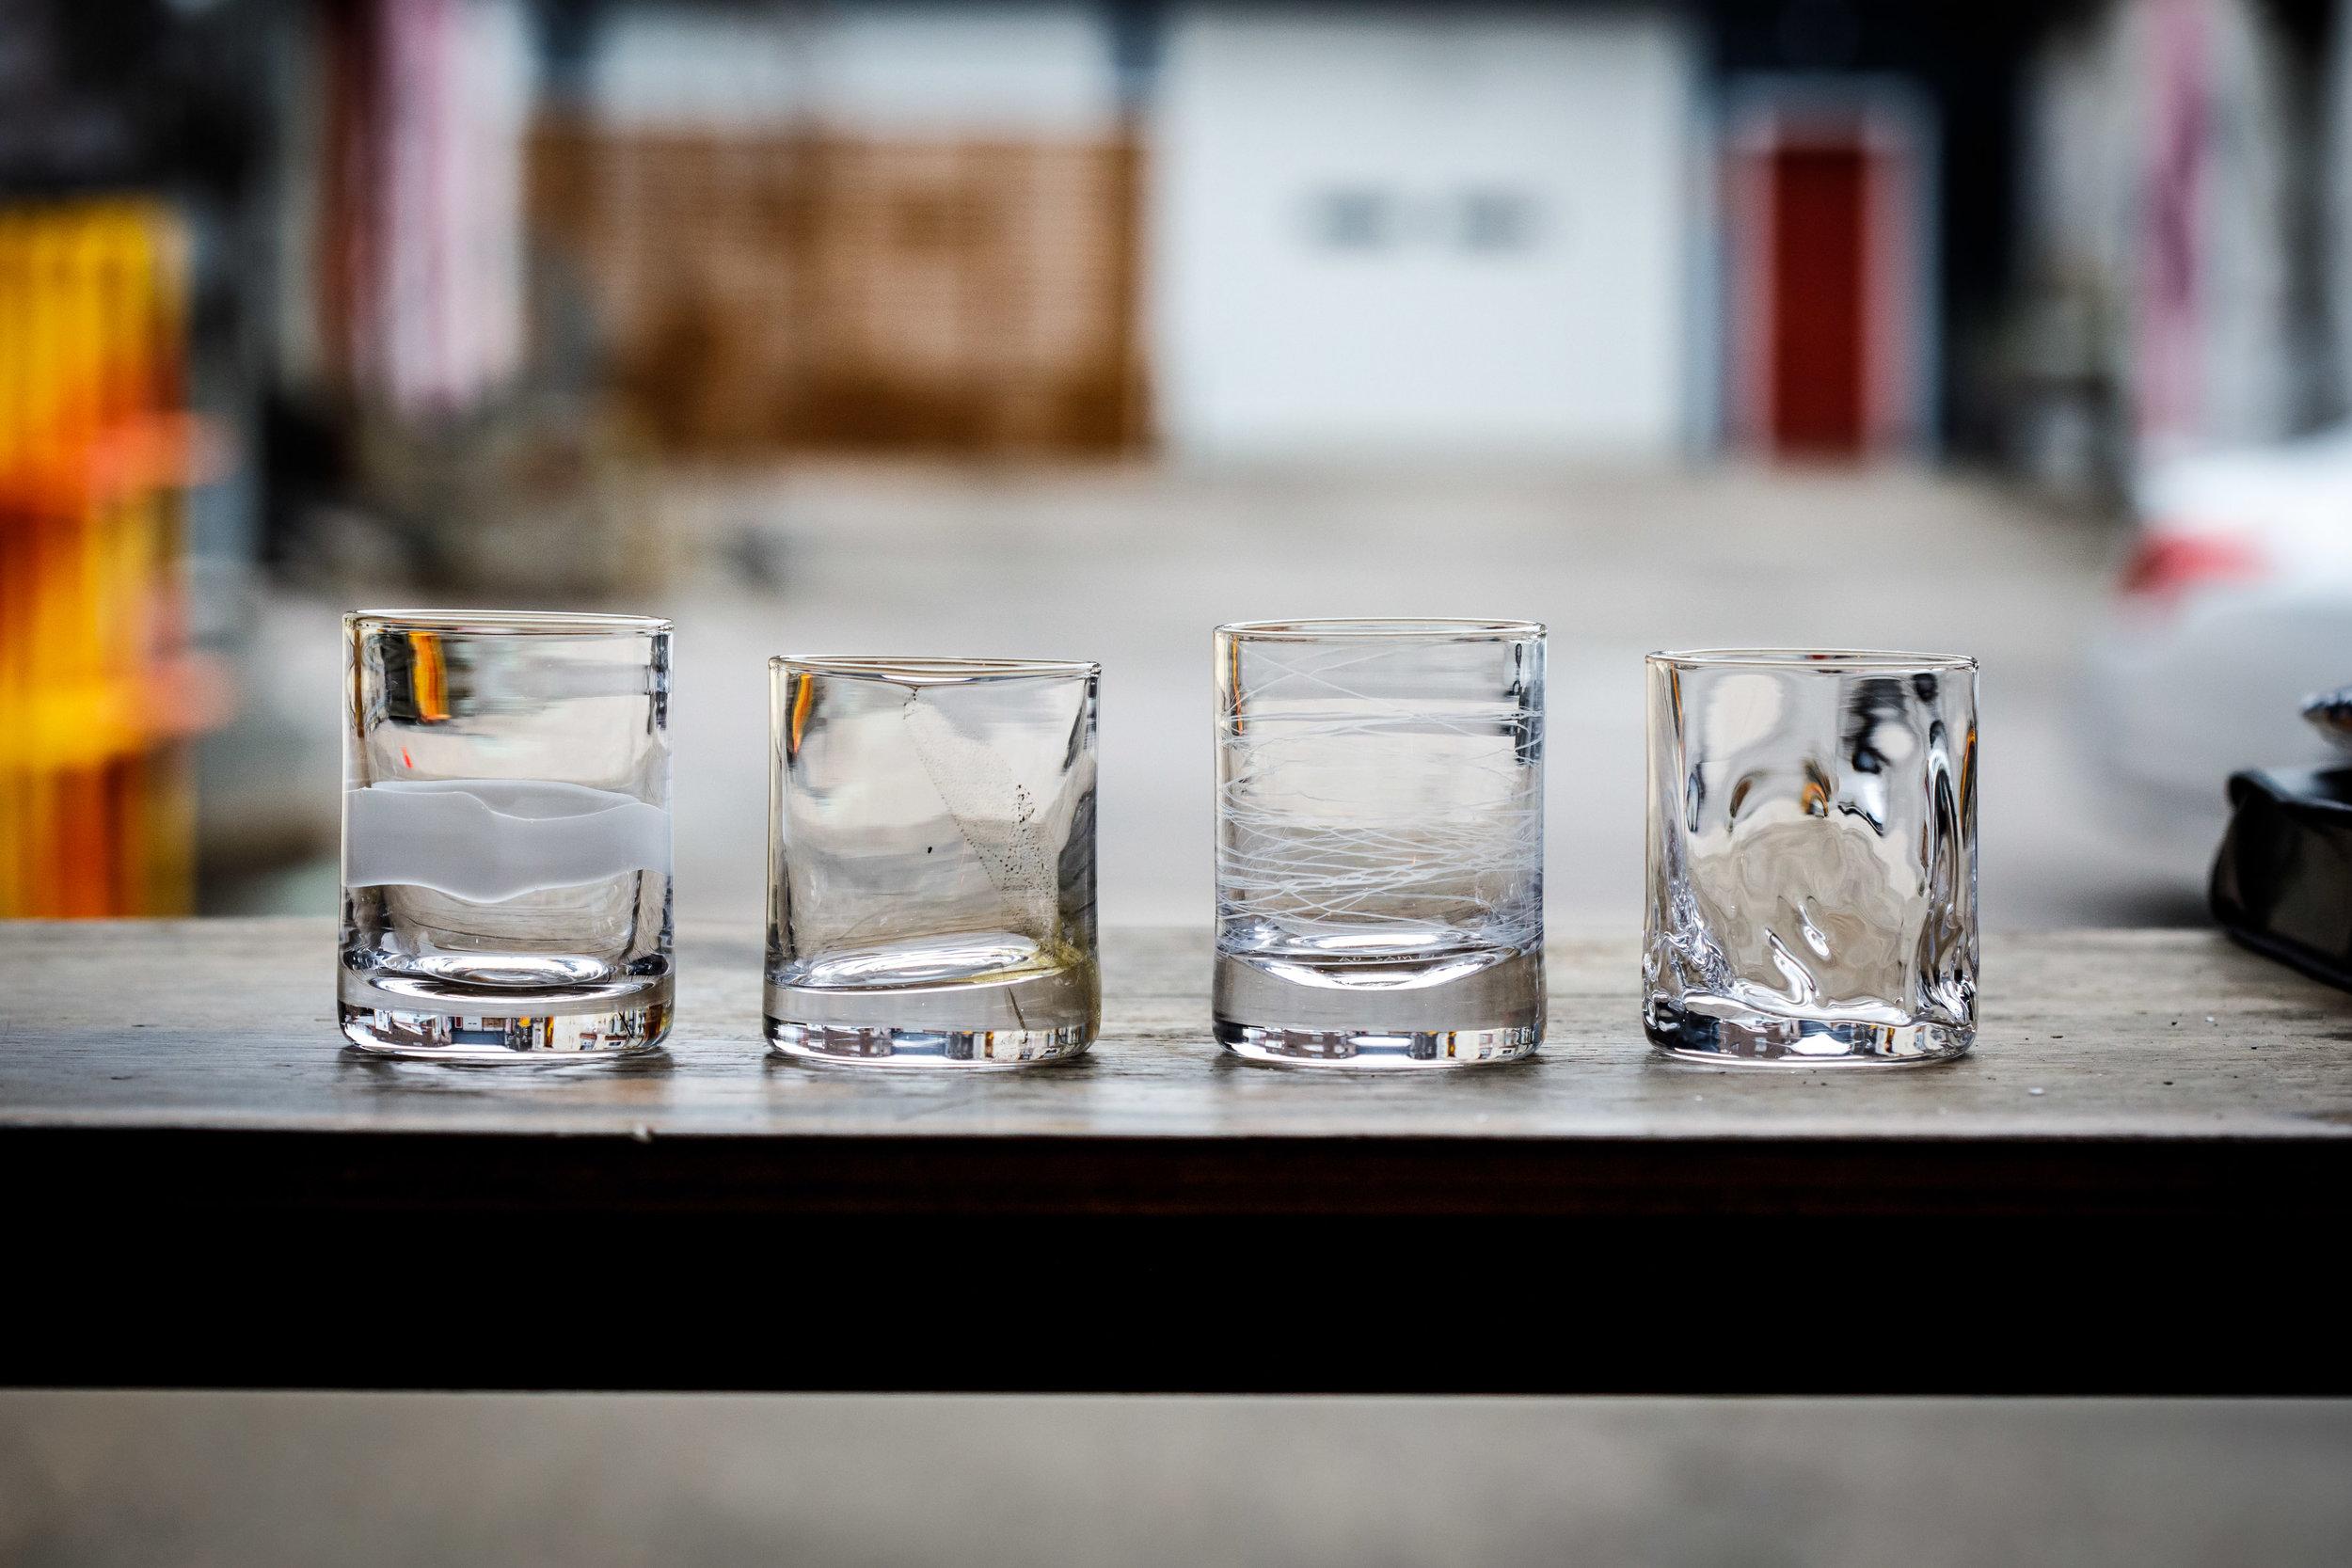 AO-Glass-14.11.17-bmac-11-21.jpg